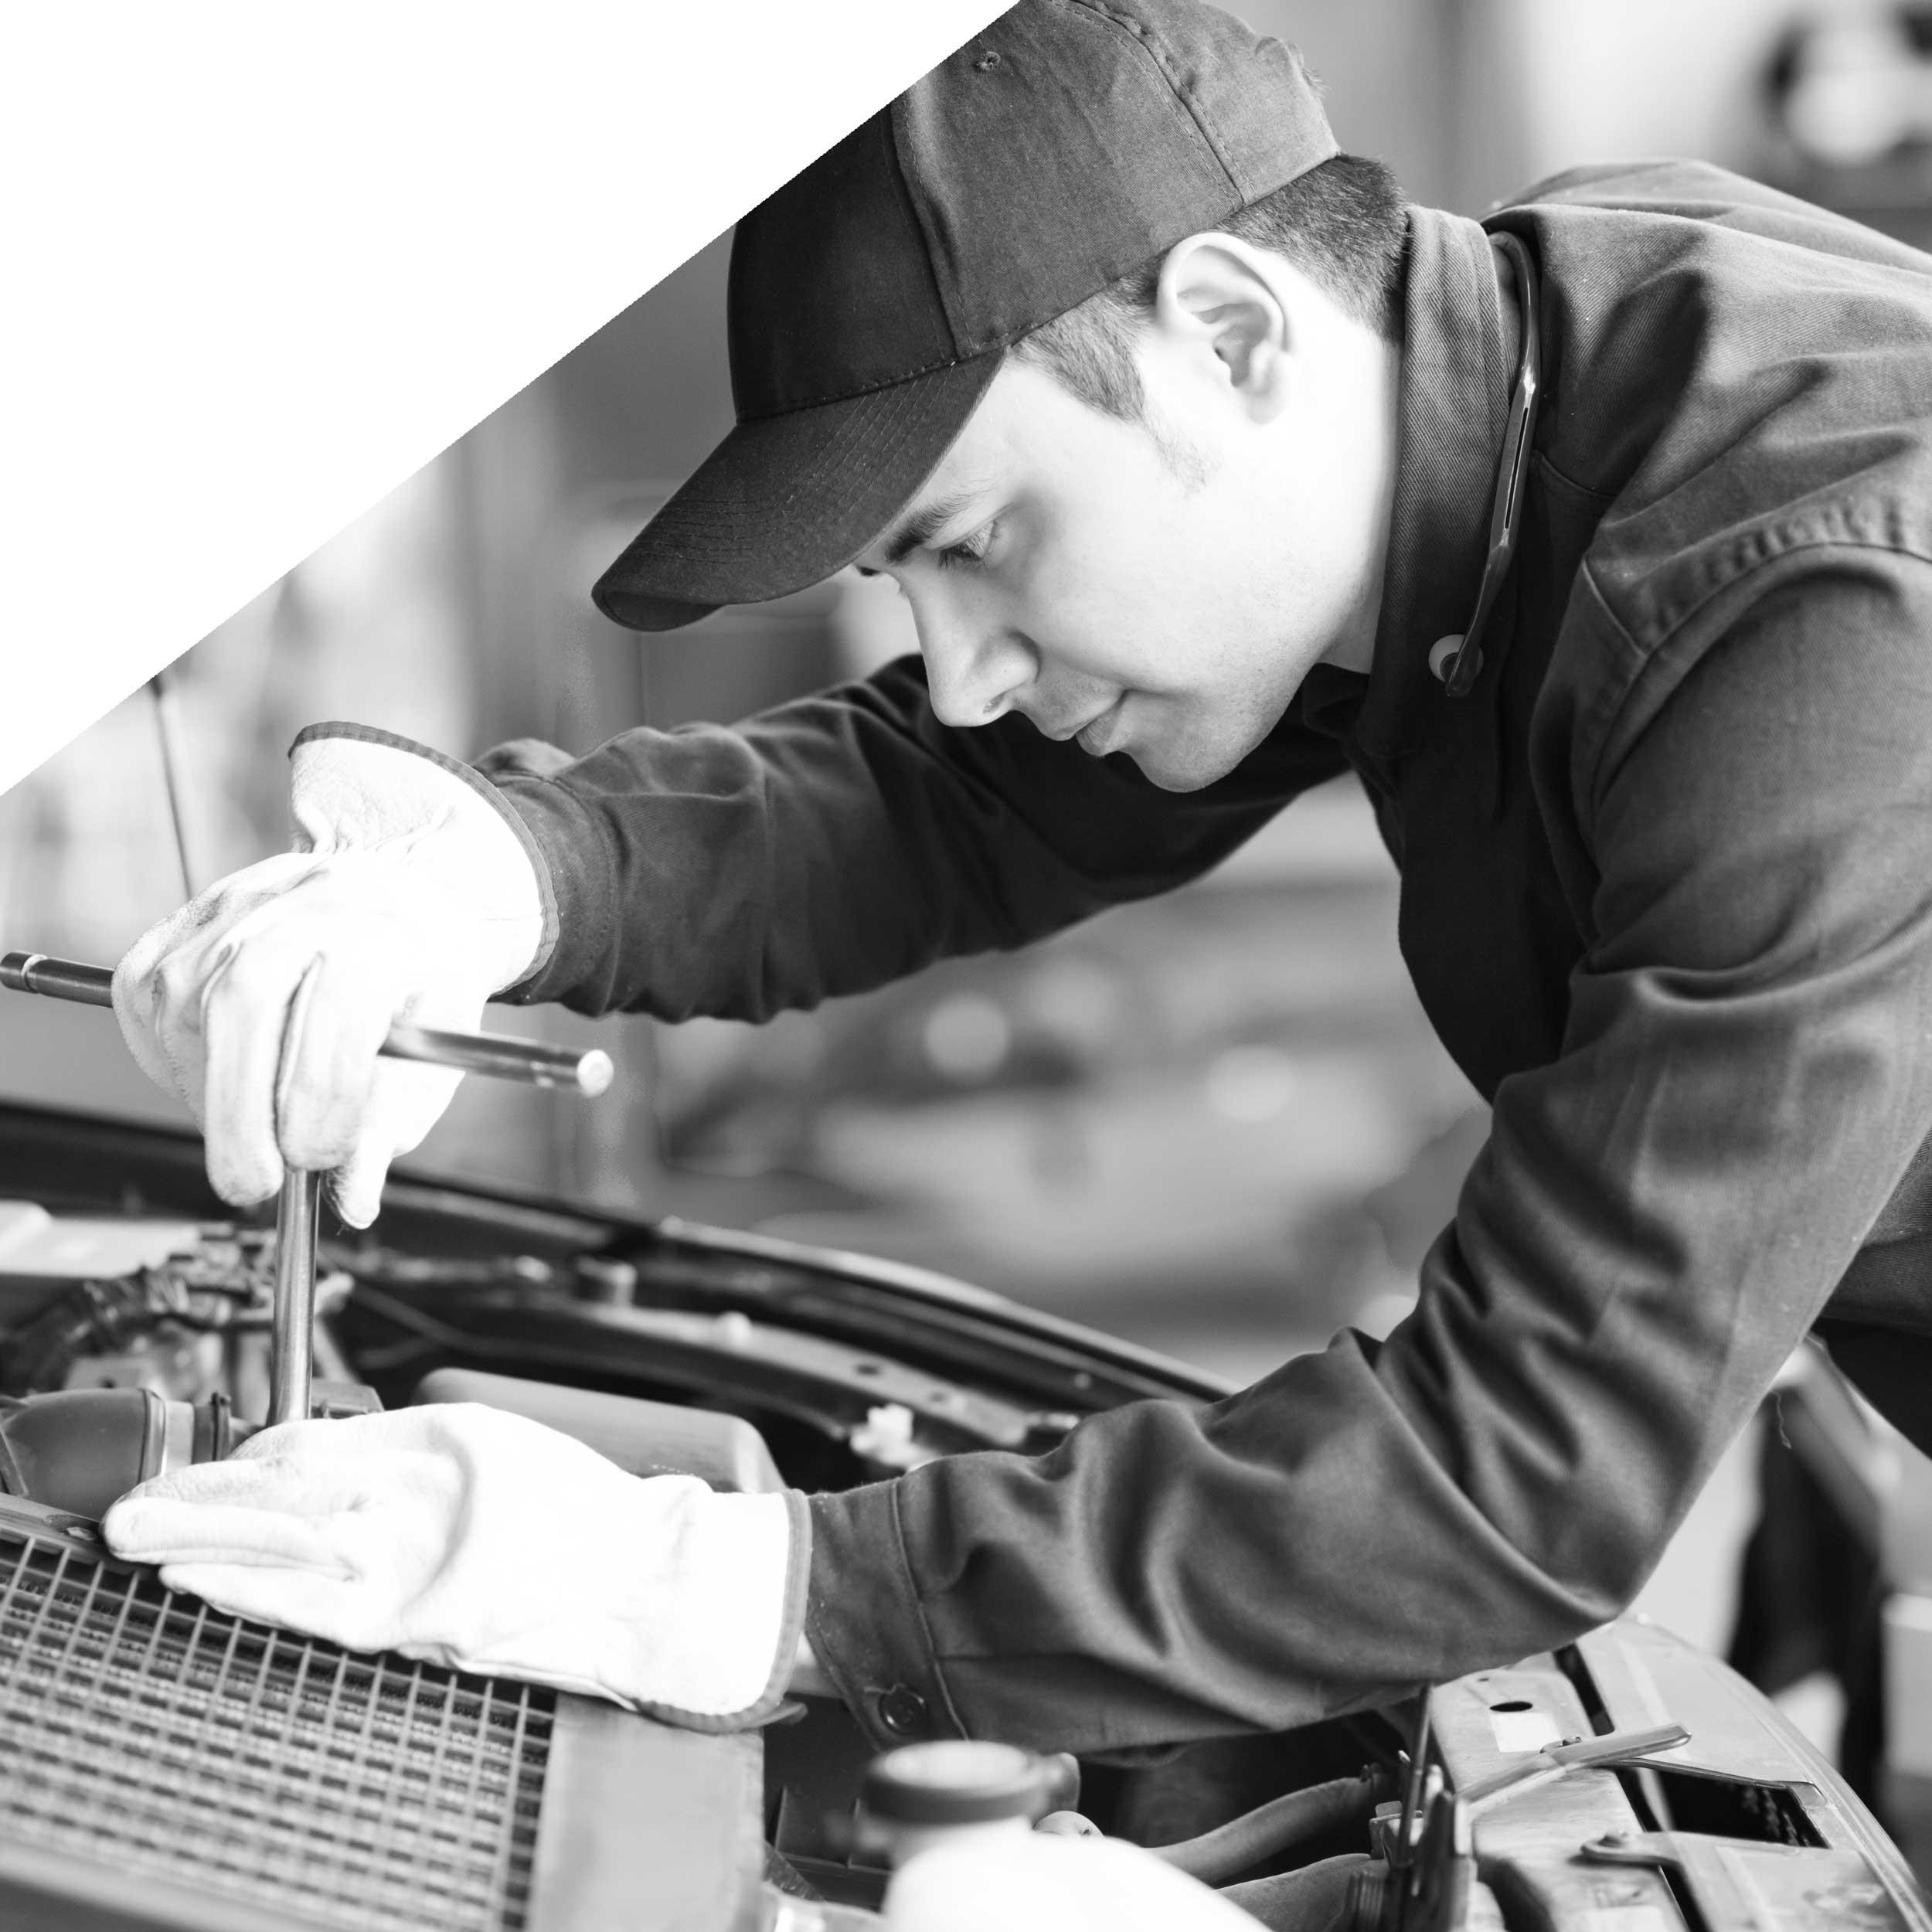 a mechanic providing truck repairs